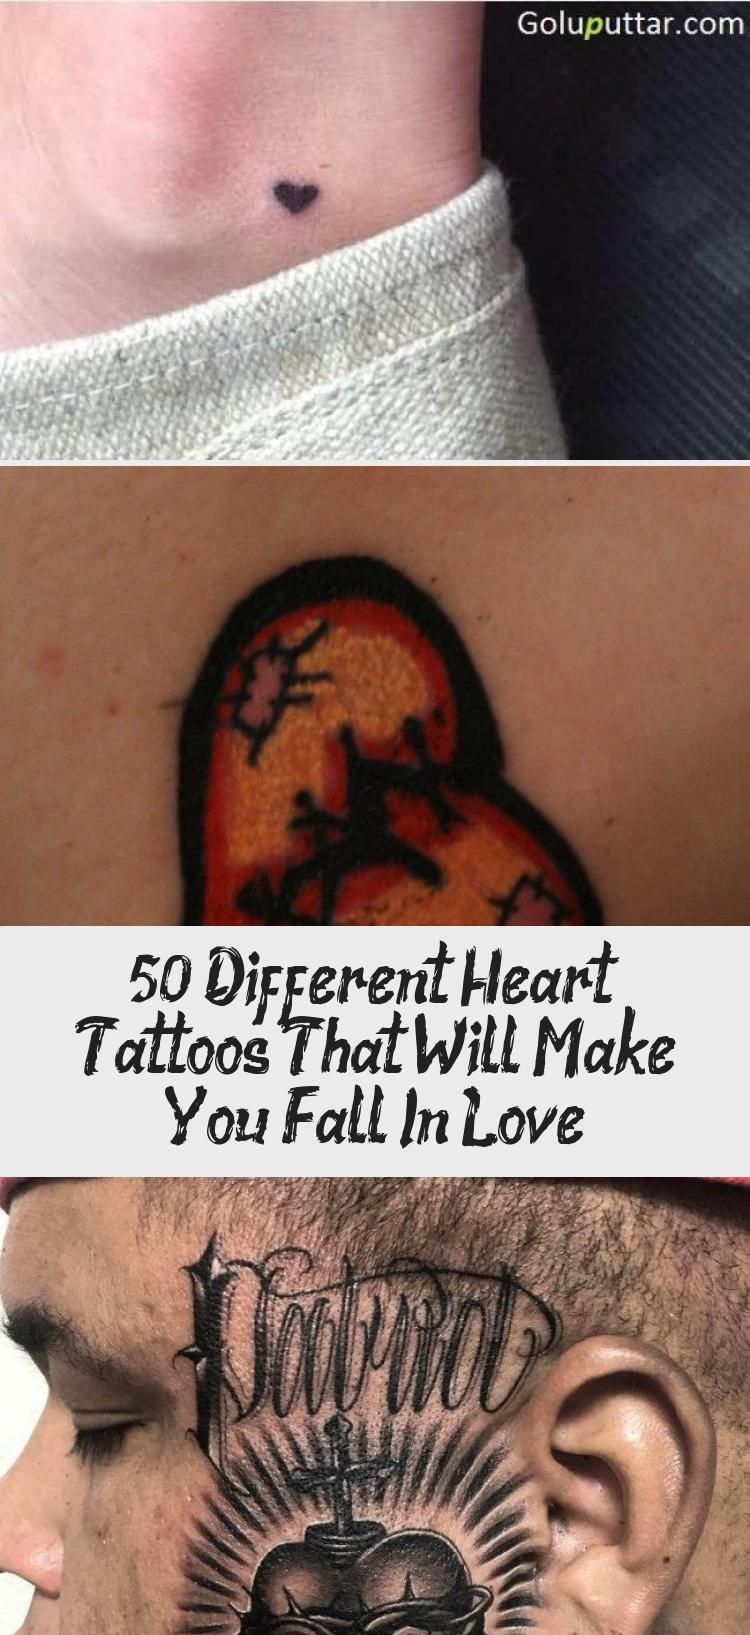 Celtic Heart Tattoo Hearttattoochest Hearttattooribs Watercolorhearttattoo Hearttattooline Hearttatt In 2020 Heart Tattoo Broken Heart Tattoo Sacred Heart Tattoos